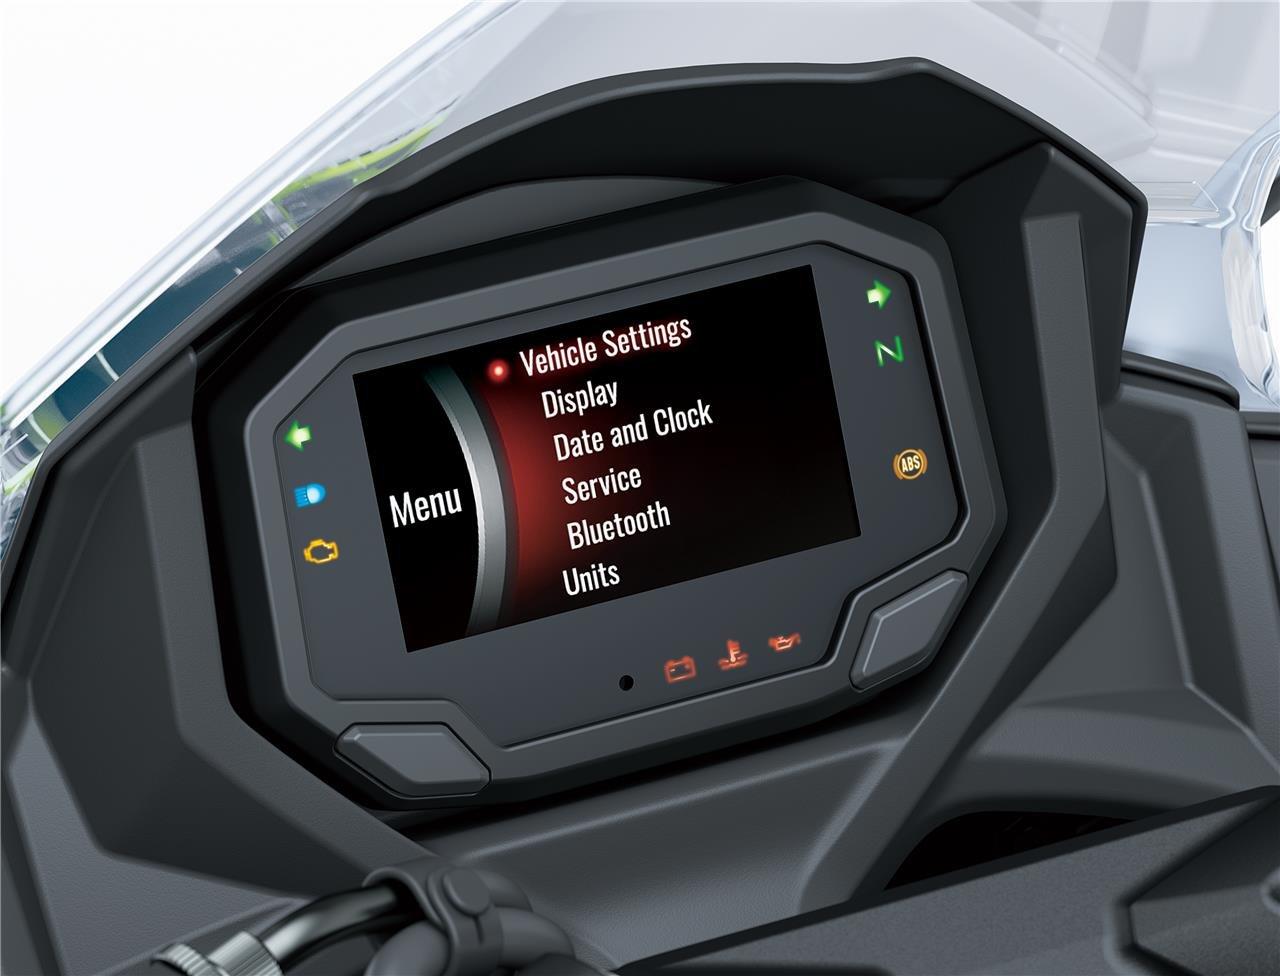 New 2020 Kawasaki Ninja 650 ABS SE *£99 Deposit 0% APR* For Sale (picture 6 of 6)